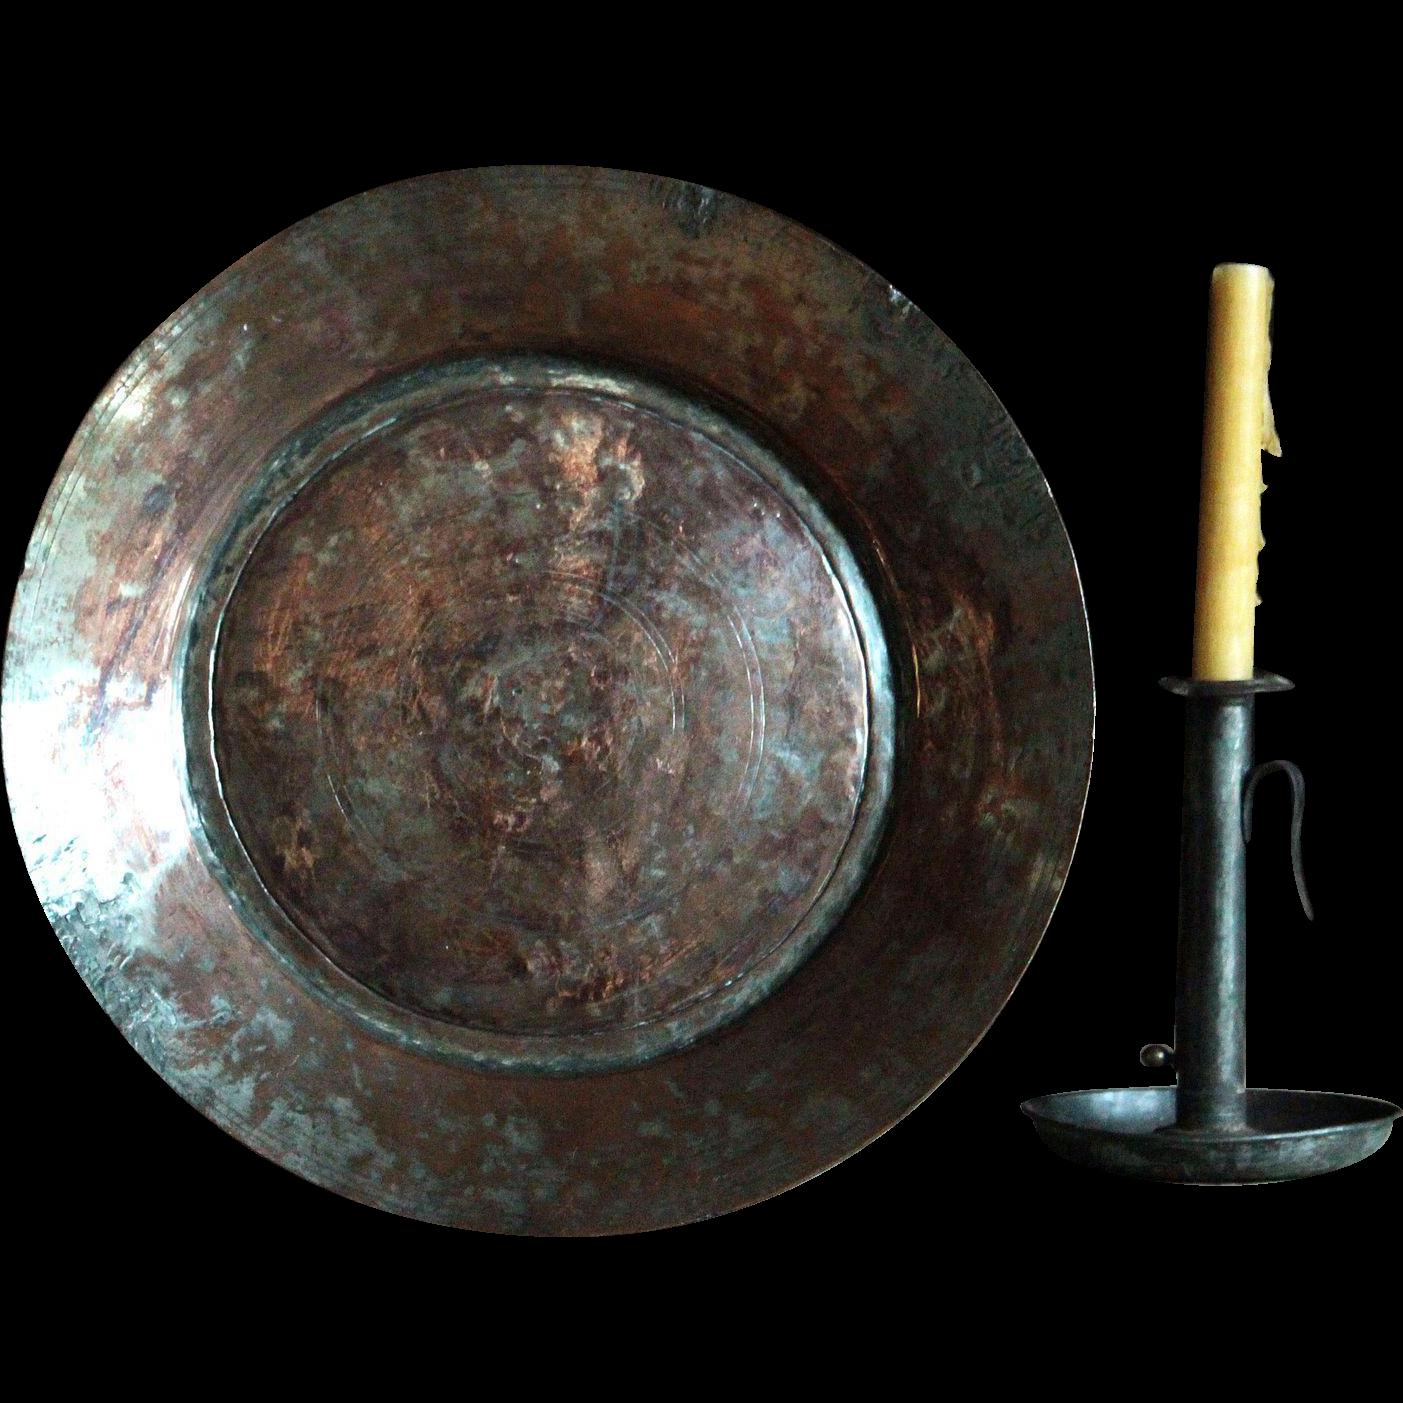 18th Century Ottoman Copper Plate - Antique Tinned Copper Serving Dish